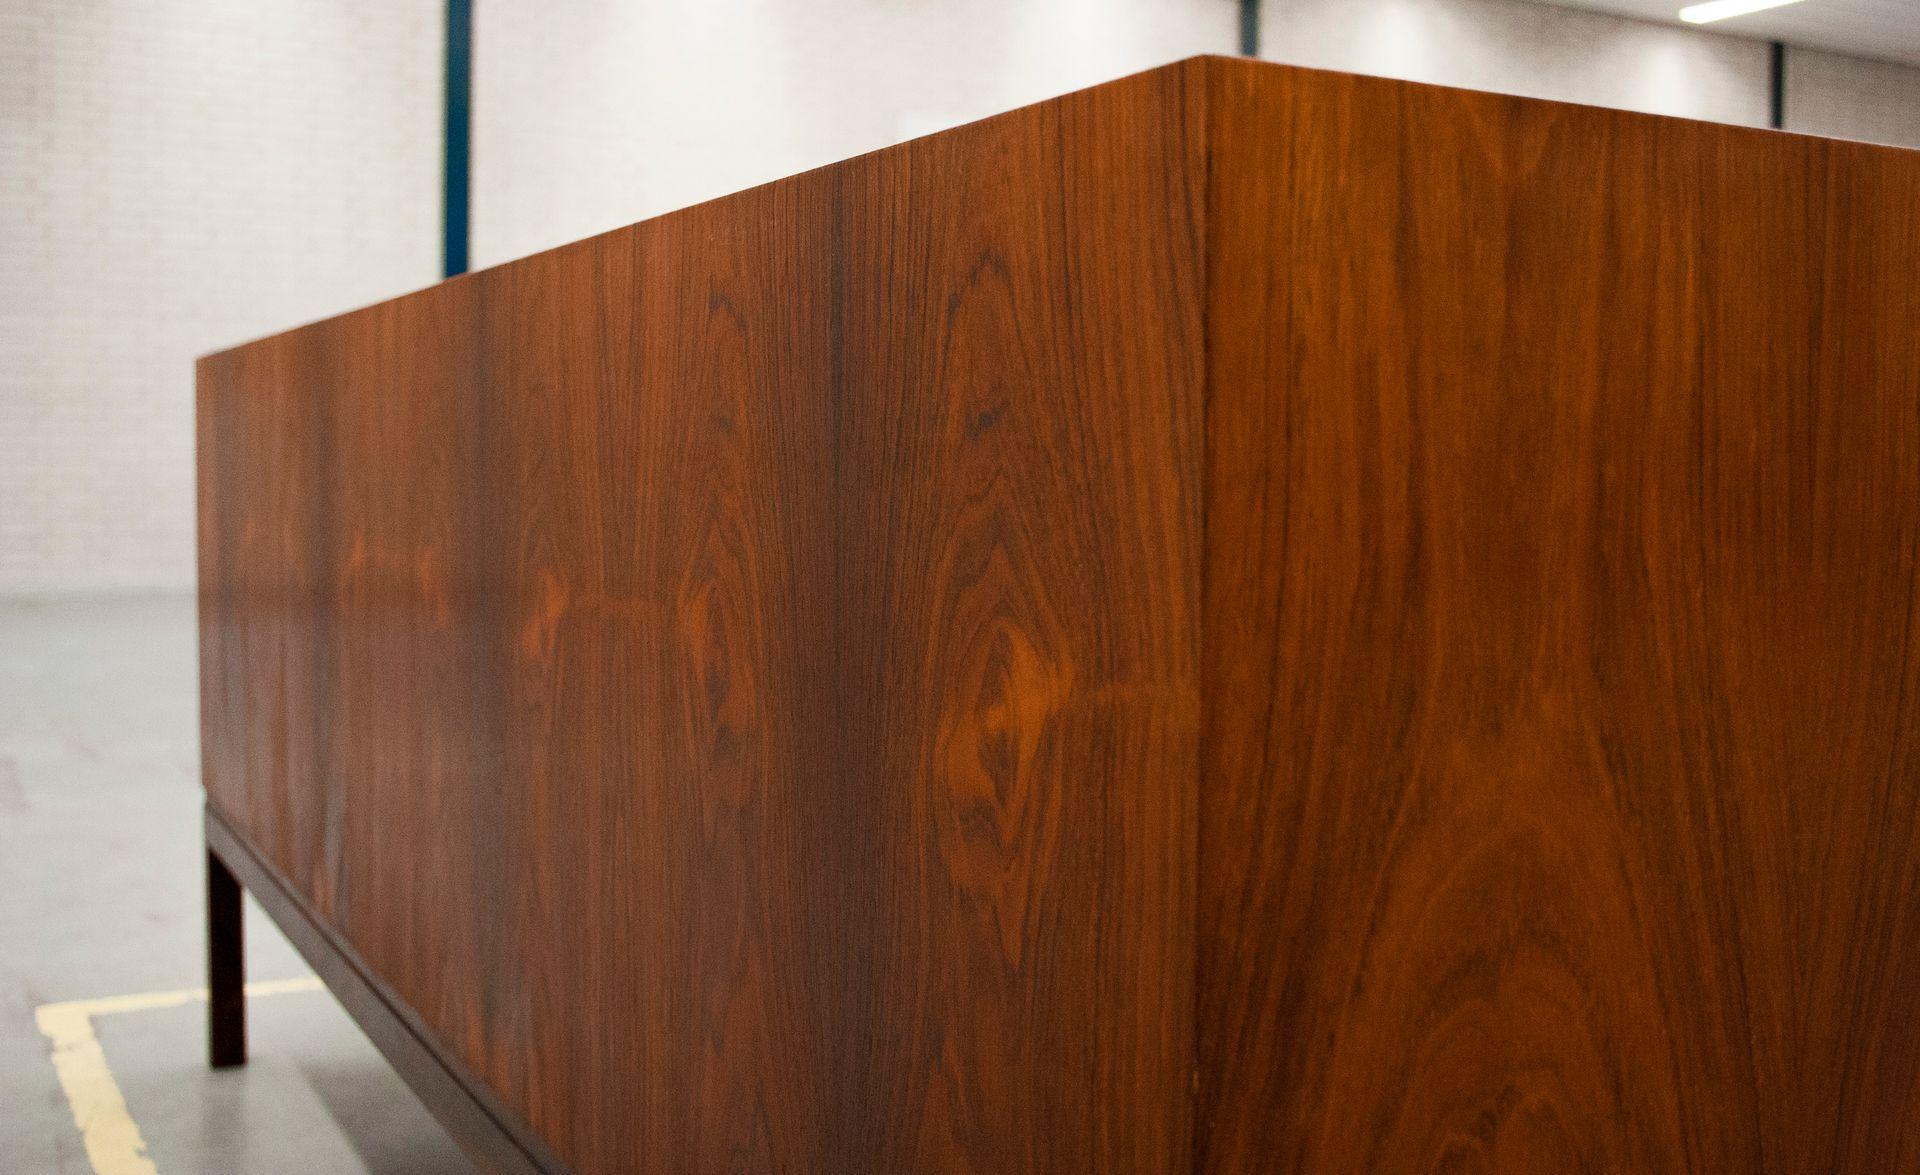 freistehendes palisander sideboard 1969 bei pamono kaufen. Black Bedroom Furniture Sets. Home Design Ideas